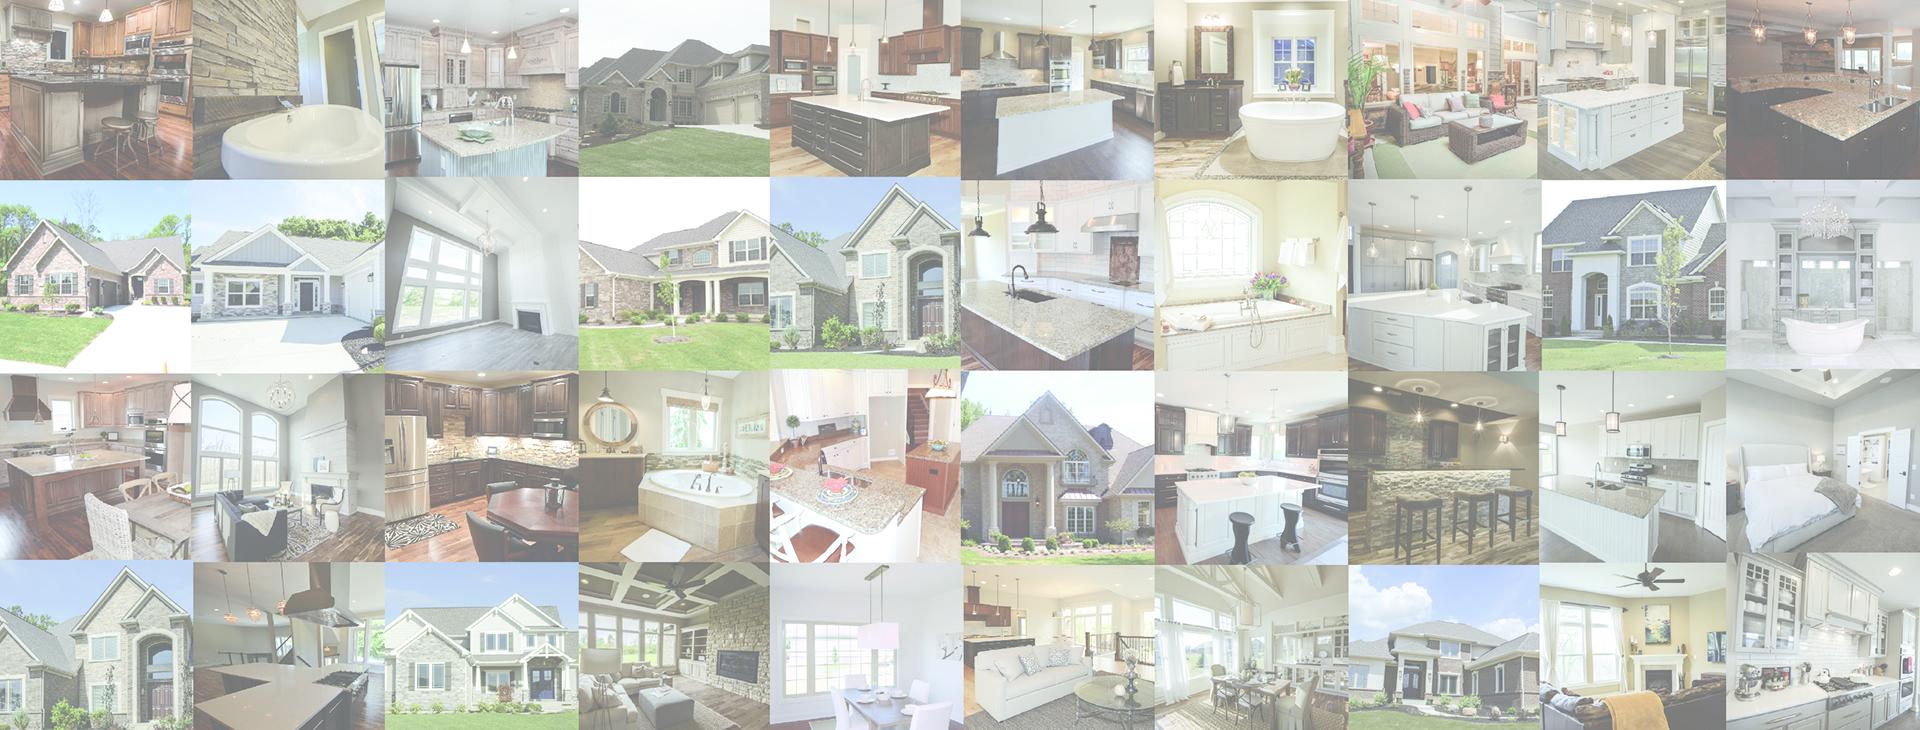 Celebrating 30 years of custom home building design homes - Celebrating home designer login ...